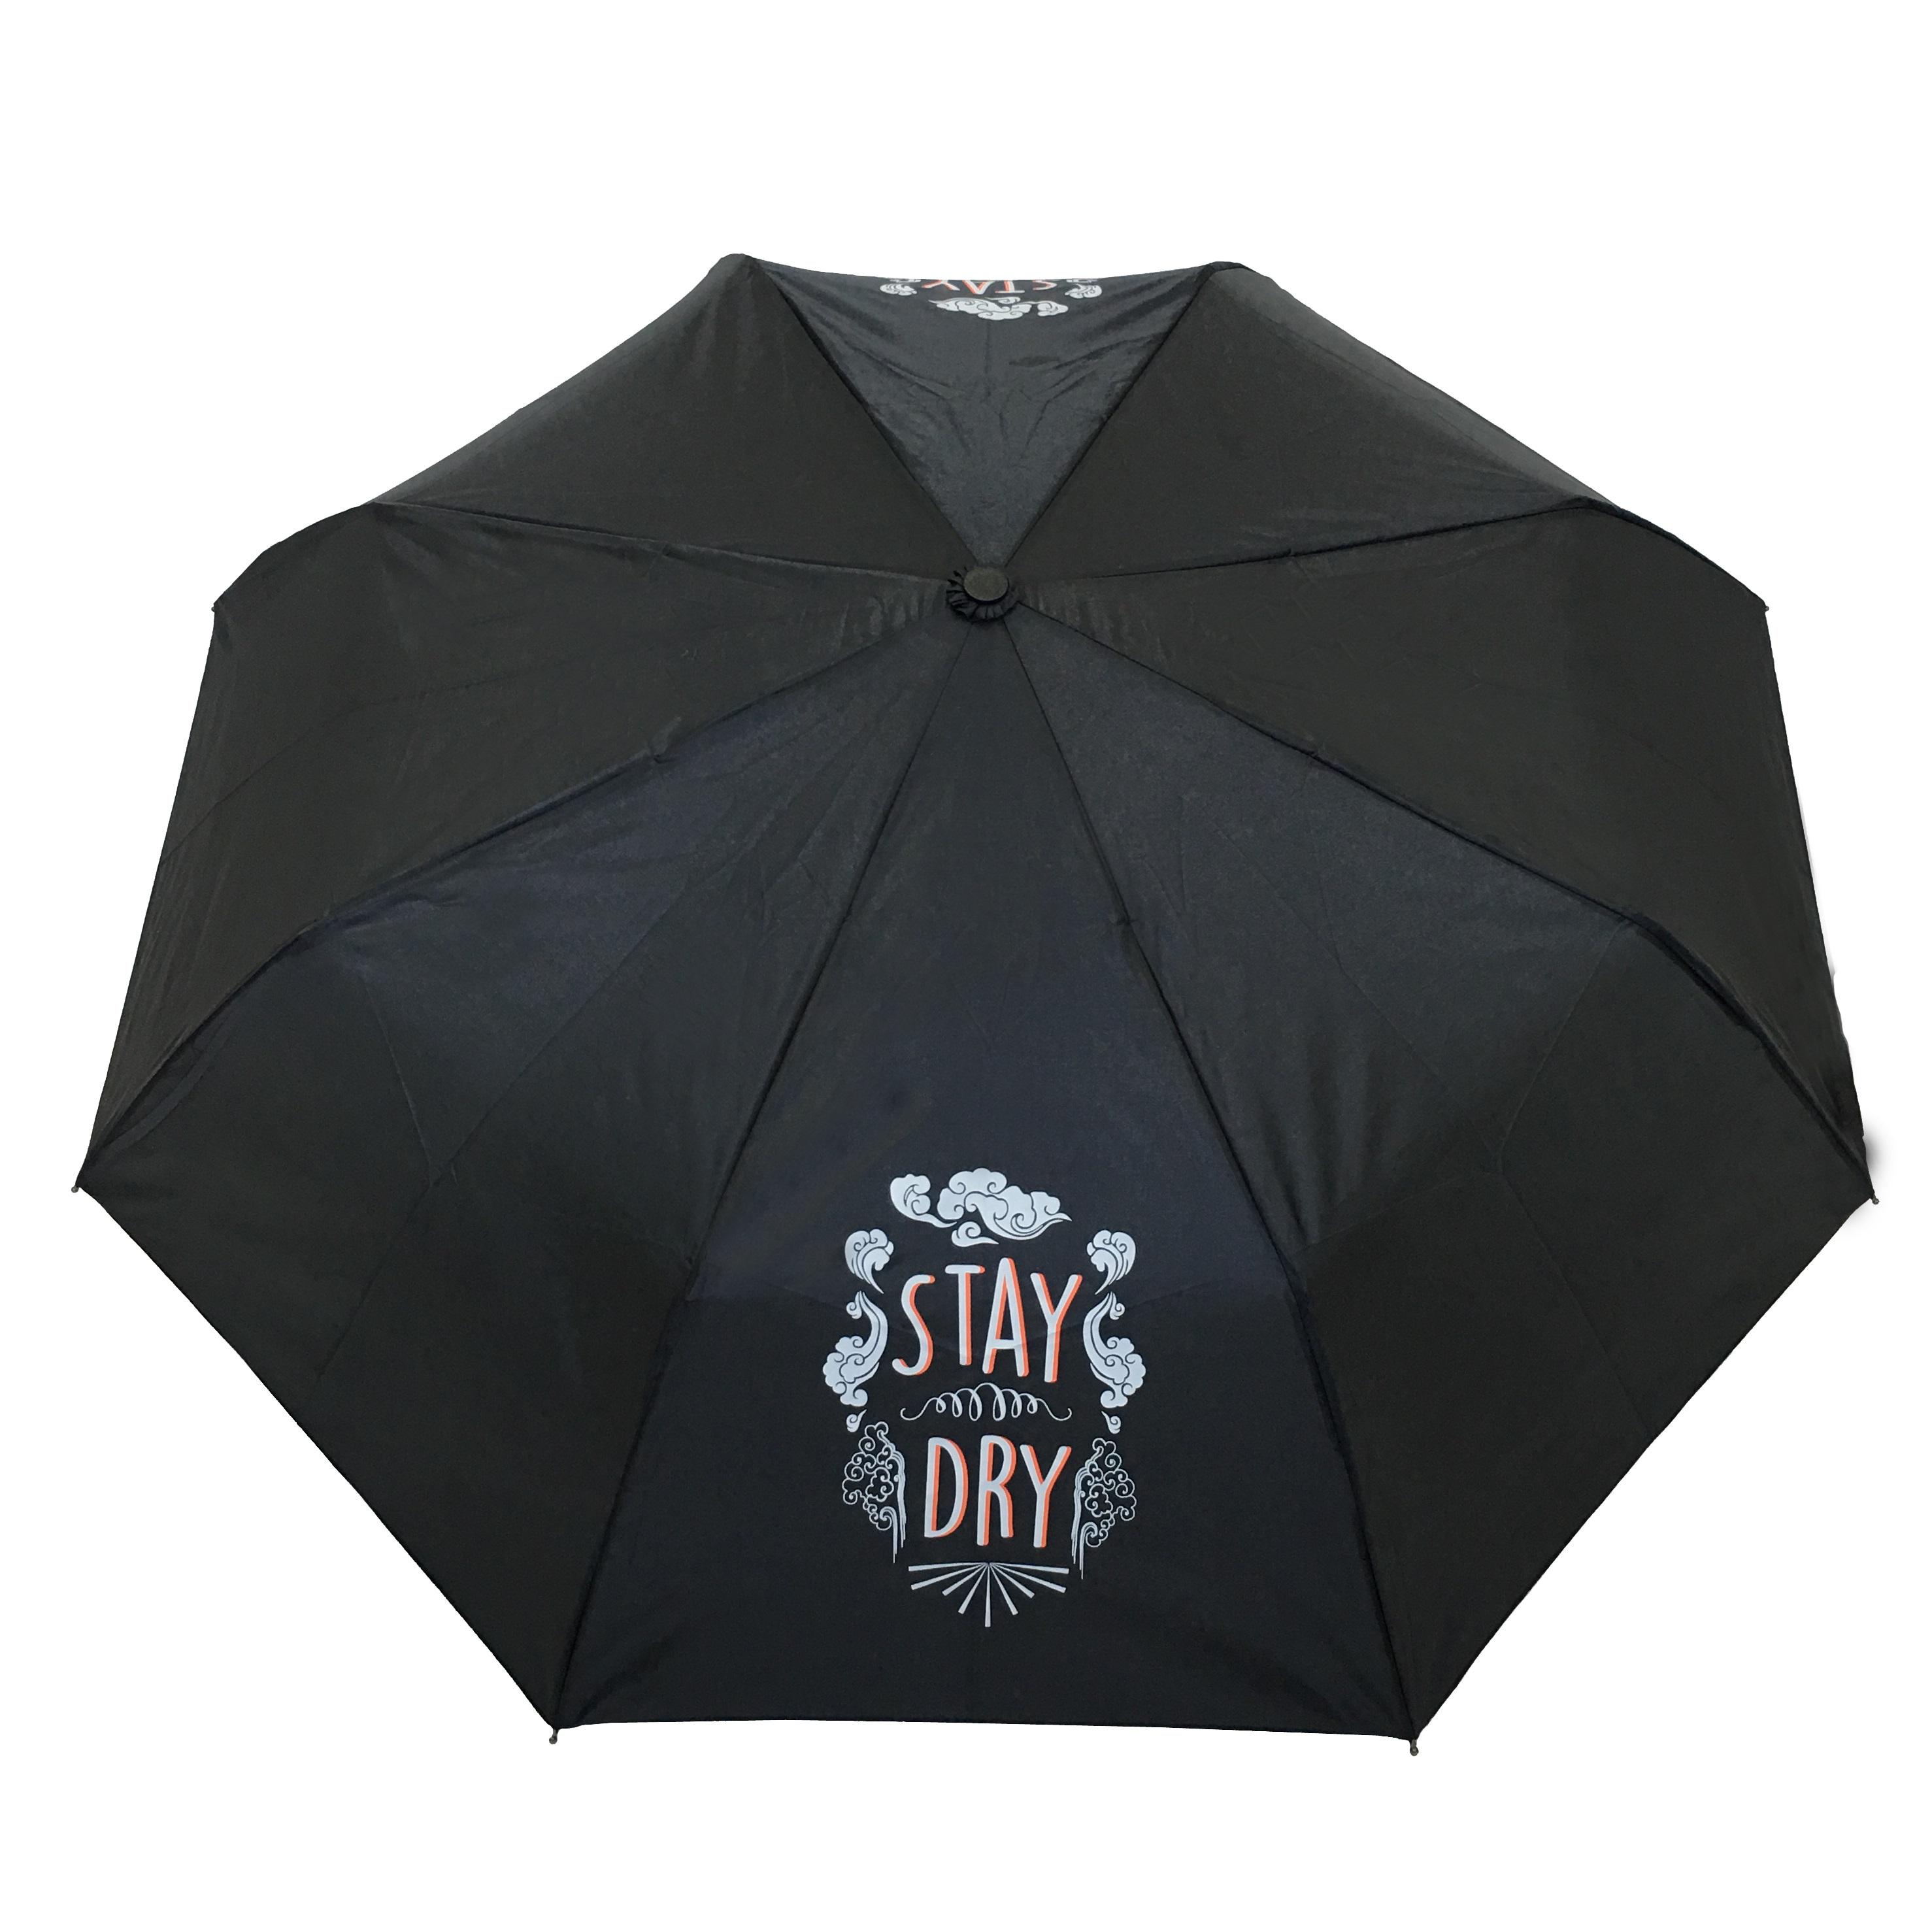 Parapluie pliant orange femme automatique - Kausia 092e968e1ab